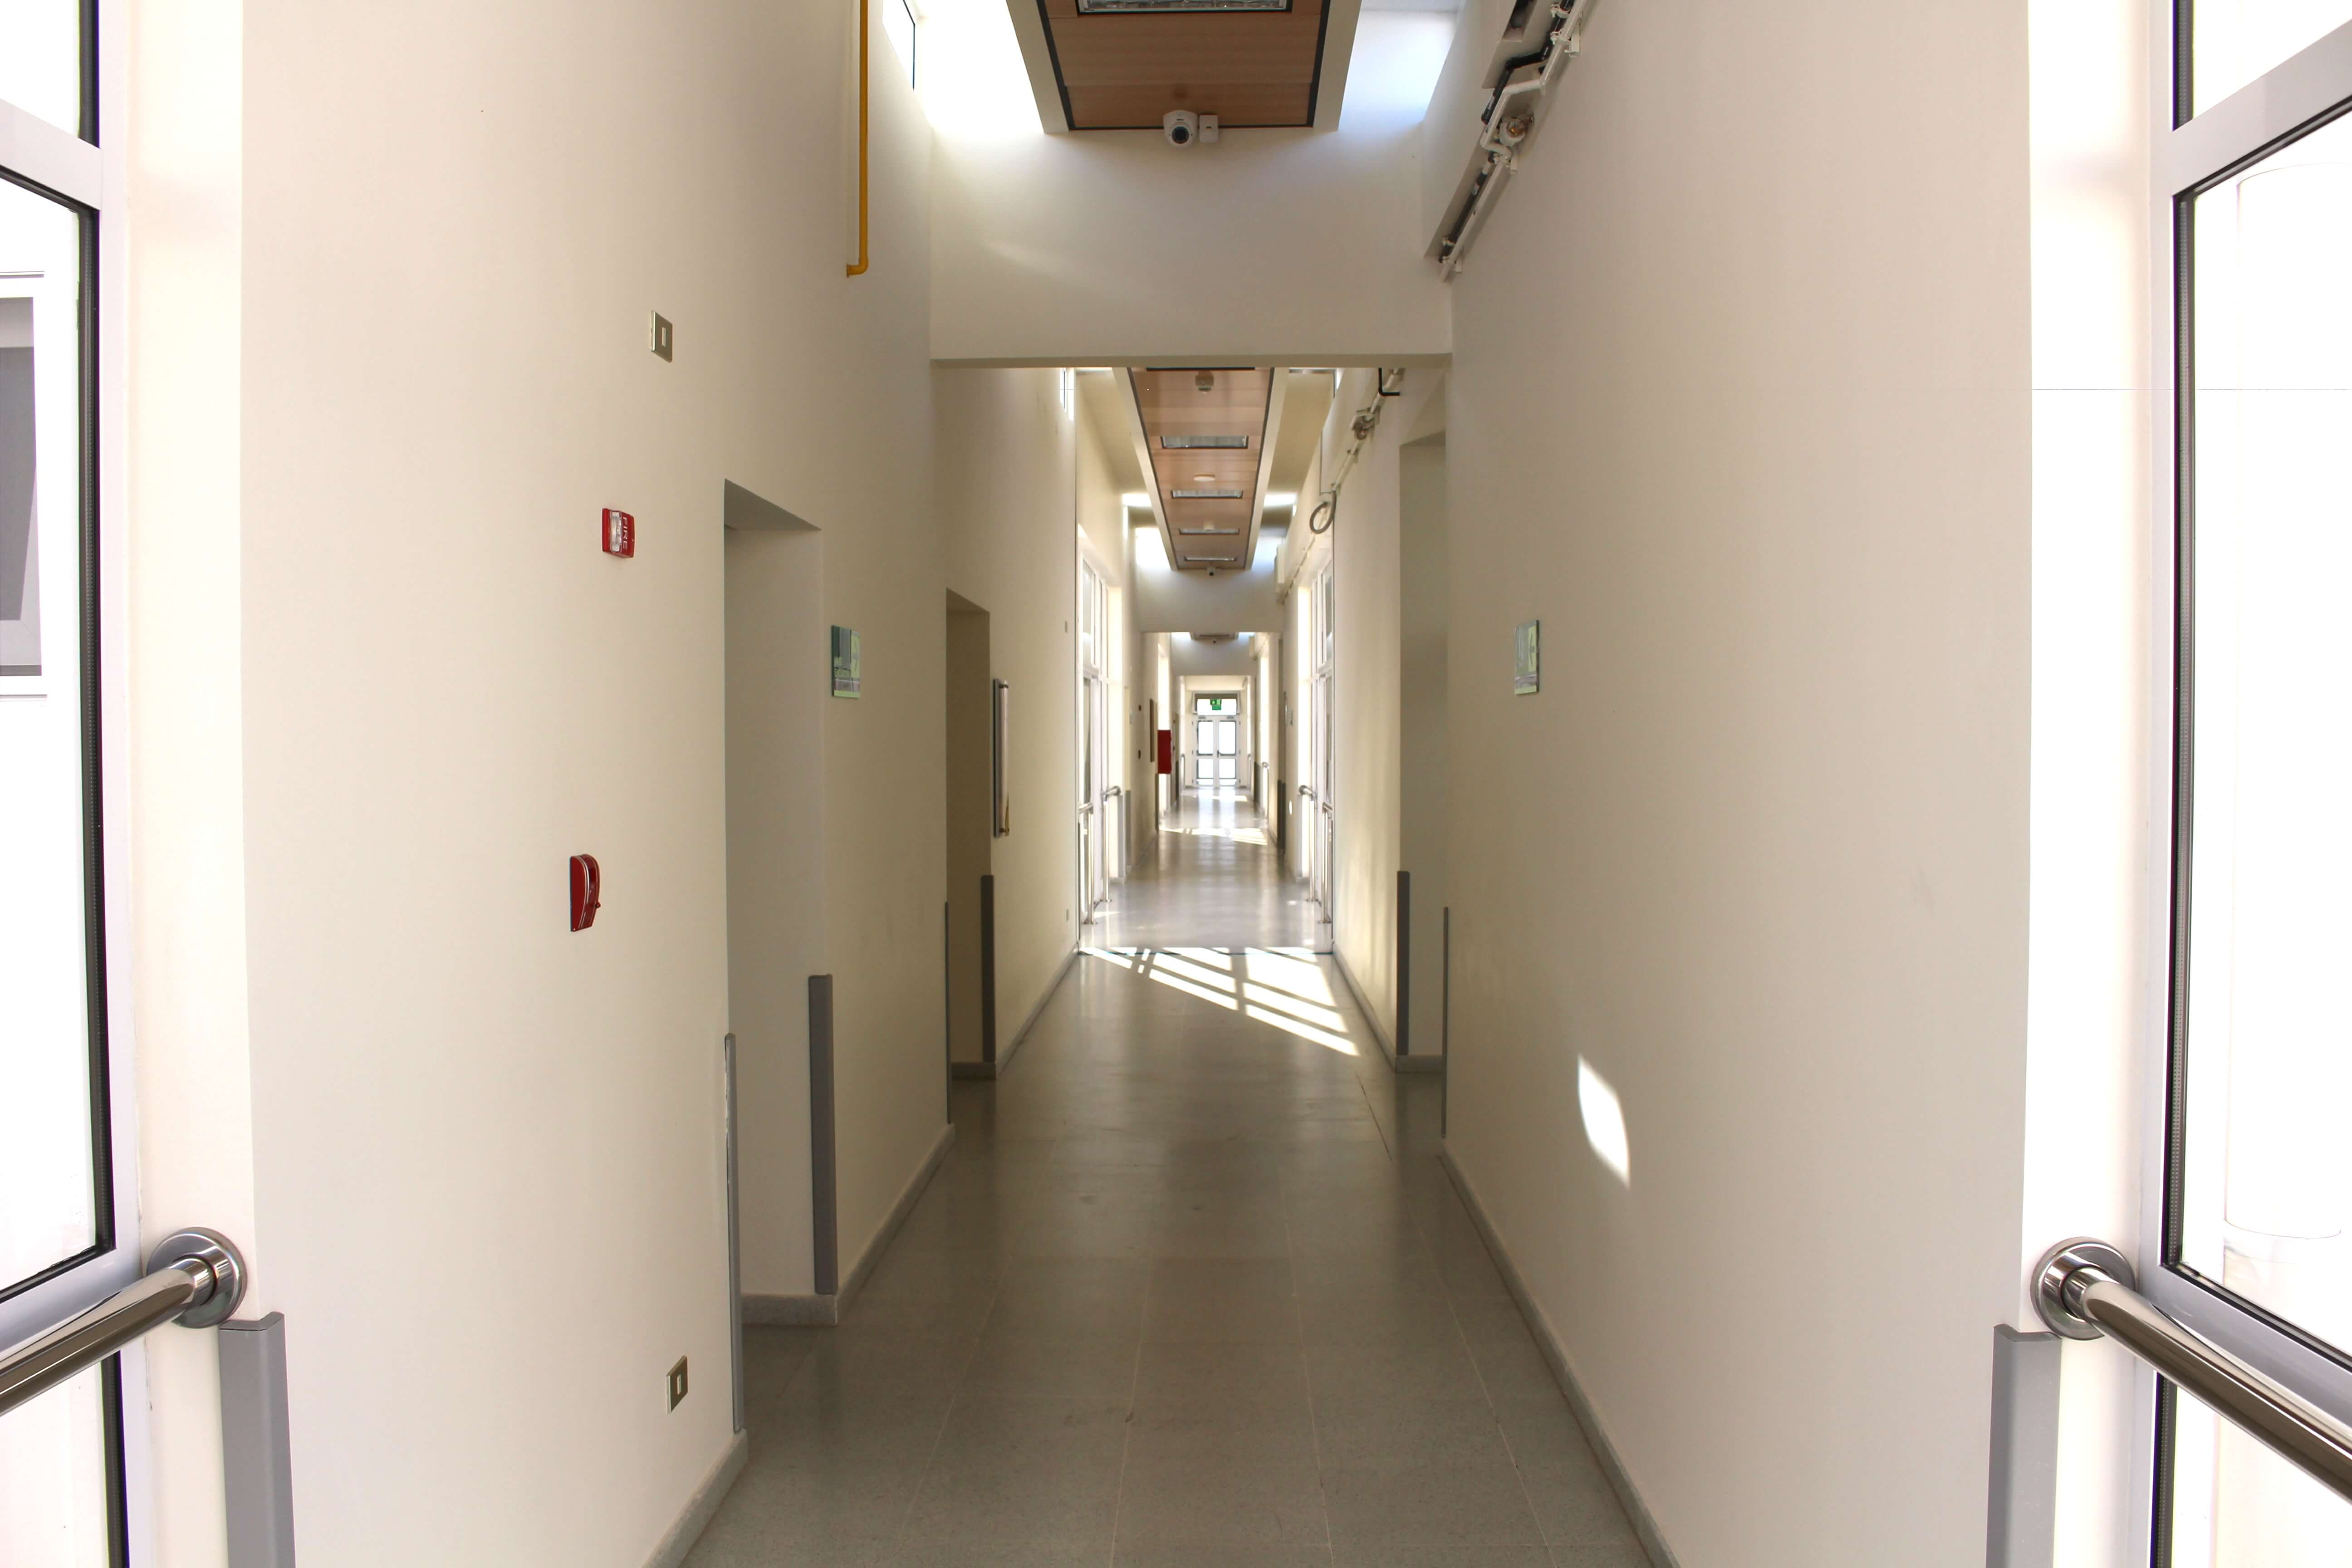 Obra-Terminada-Cesfam-El-Sauce-Coquimbo-Constructora-Rencoret-7